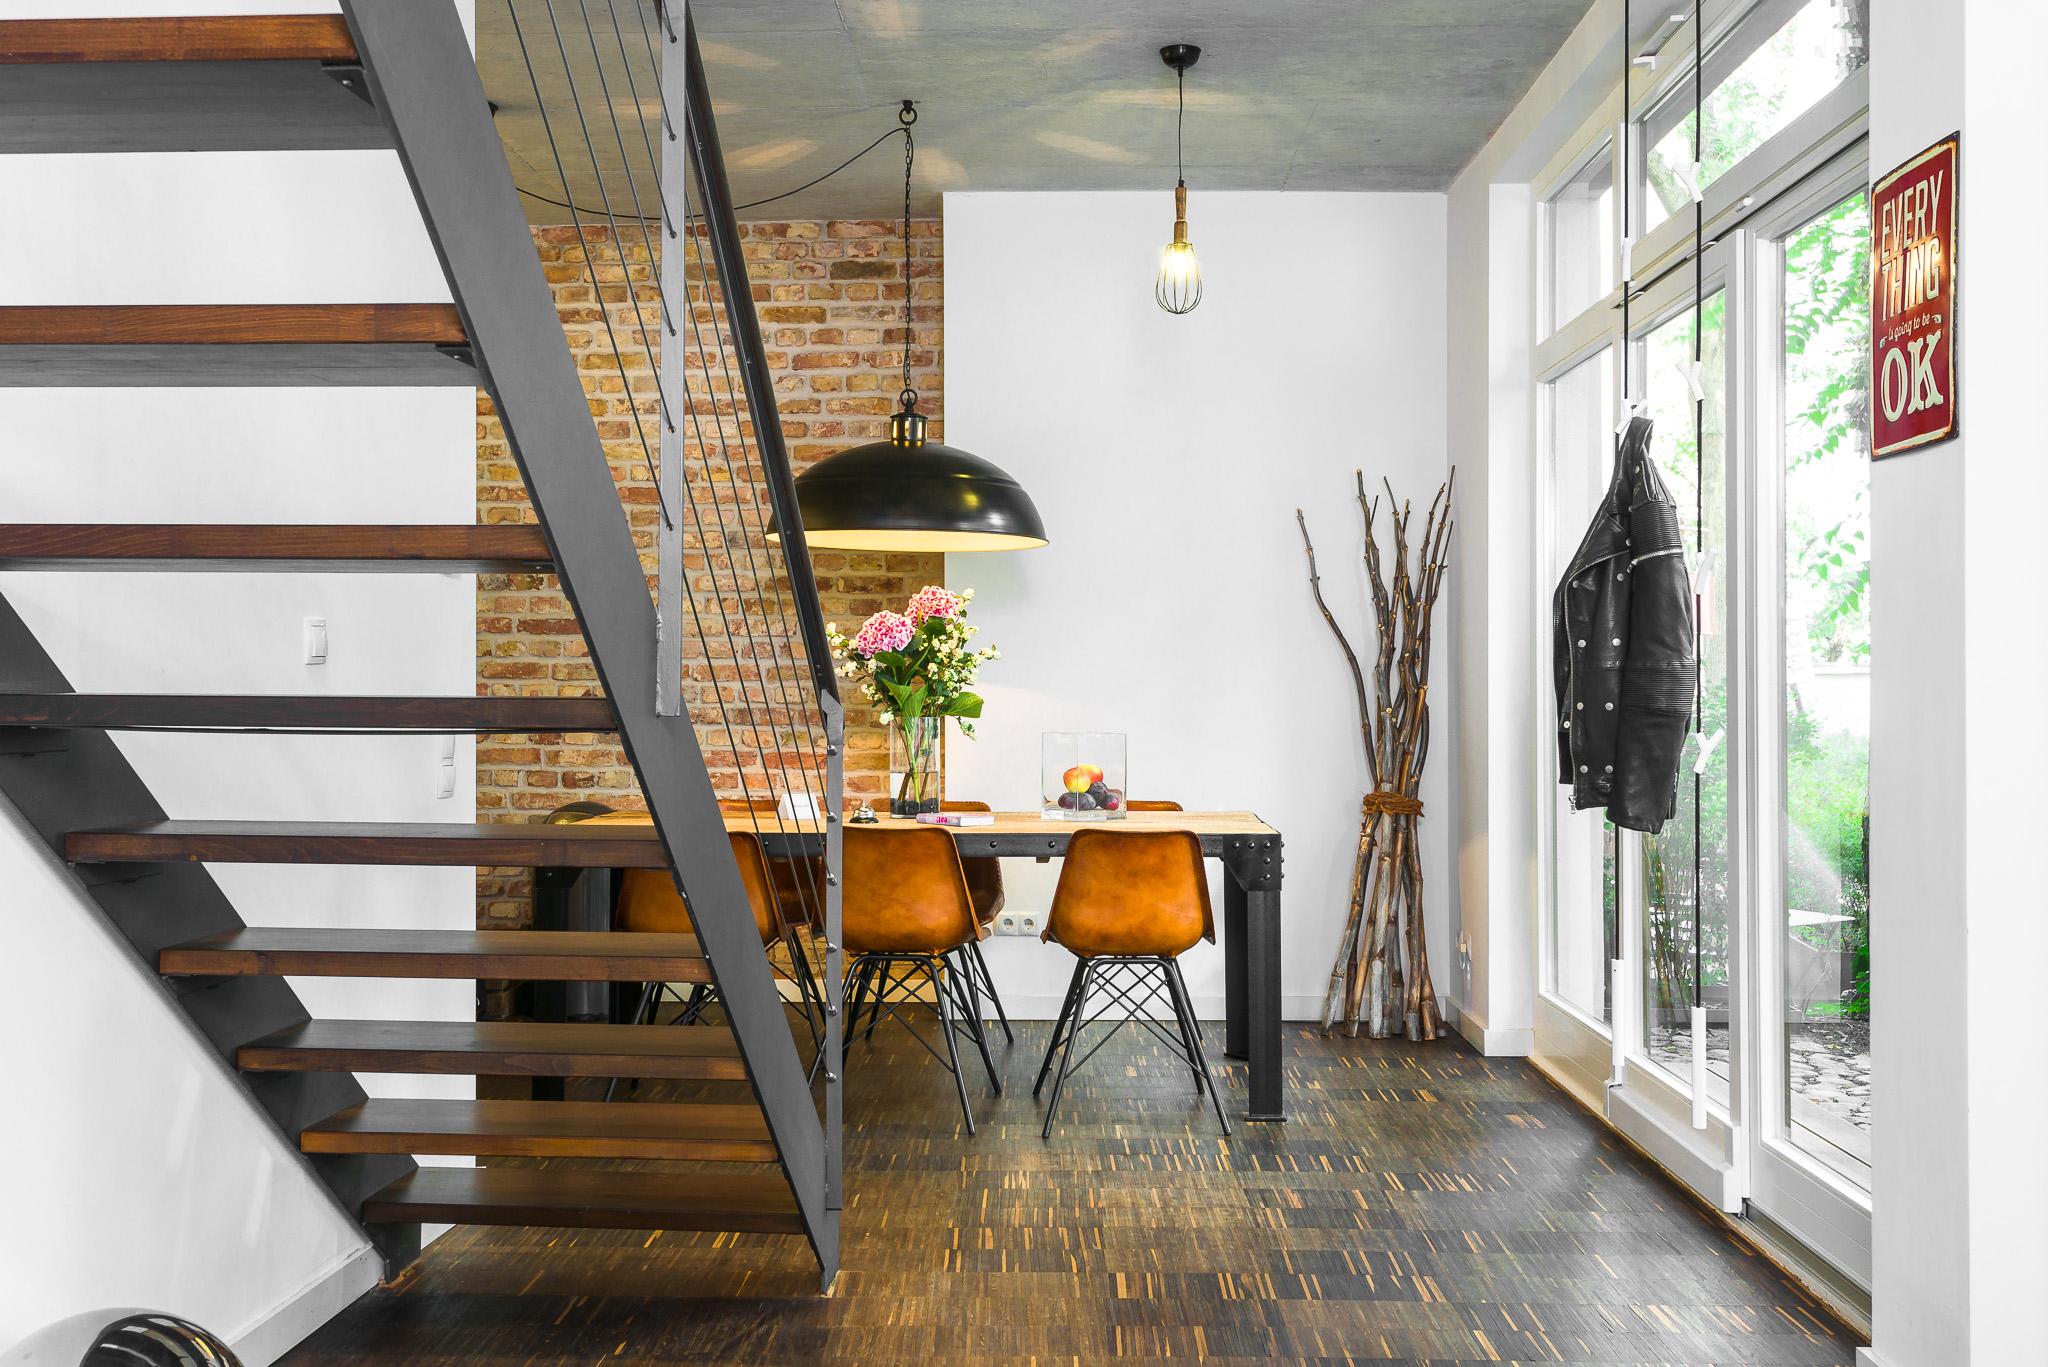 berlin-immobilienfotograf-2019-6-1.jpg